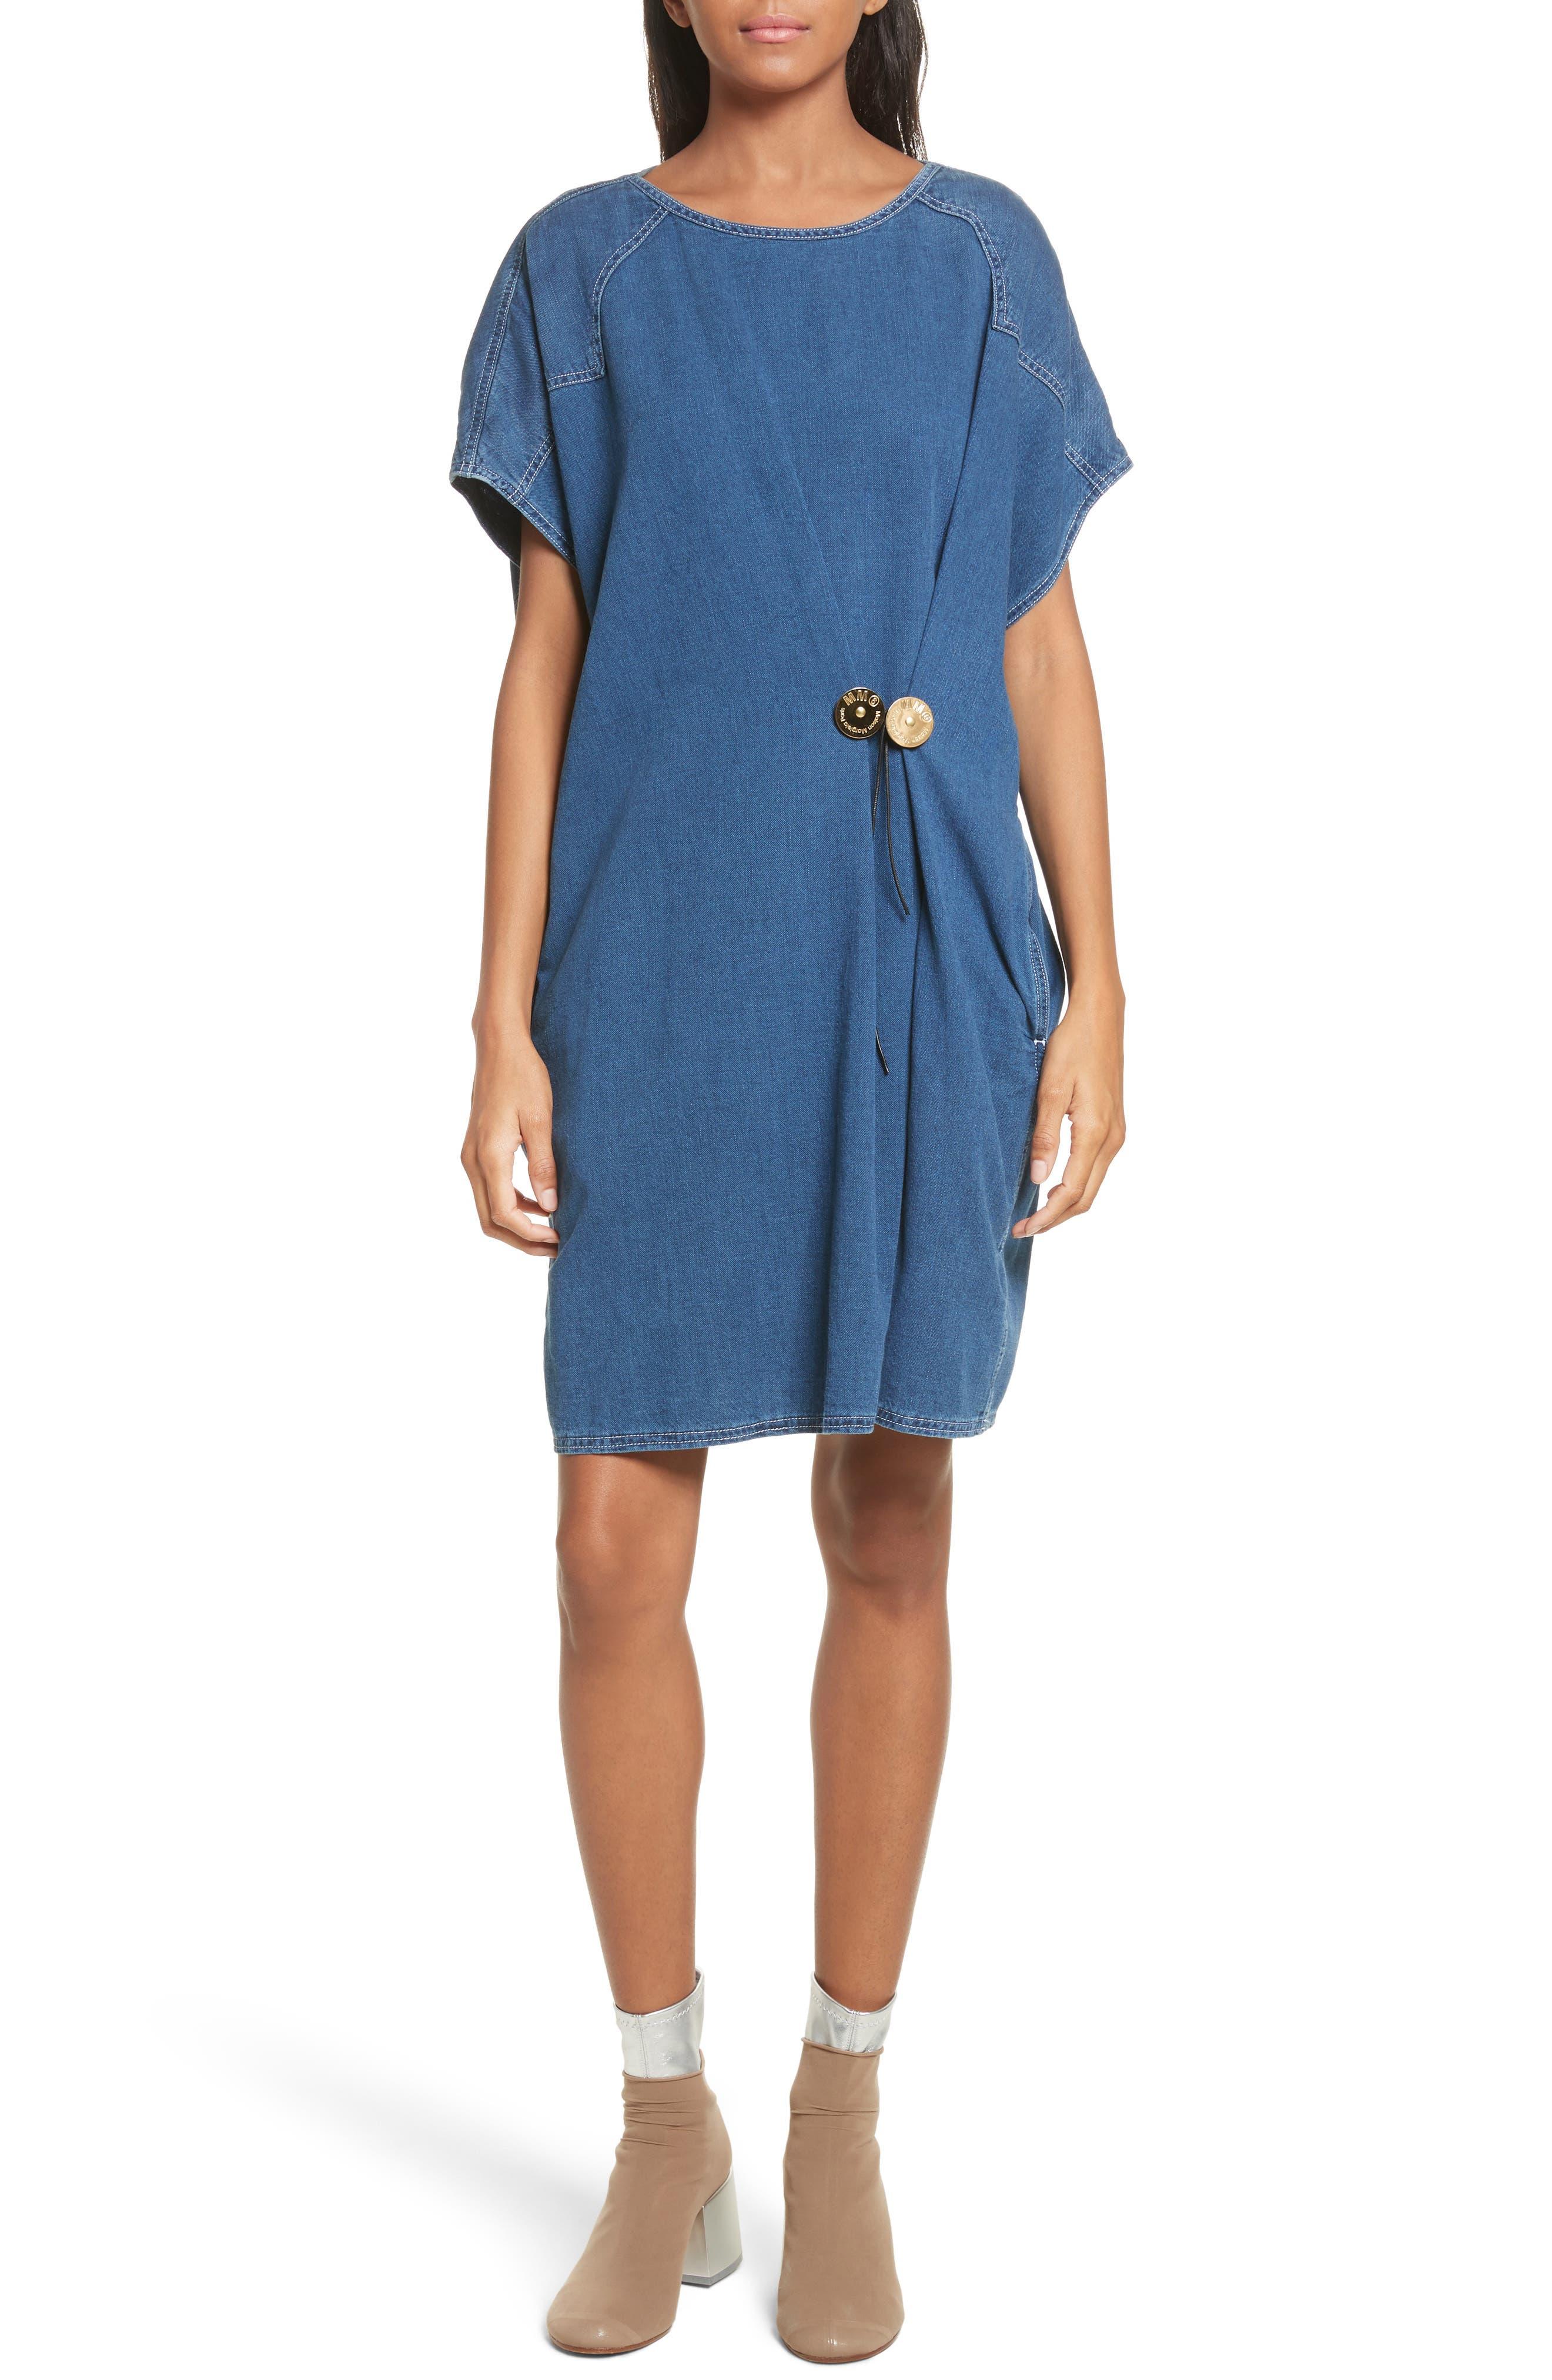 '80s Wash Denim Dress,                         Main,                         color, 400